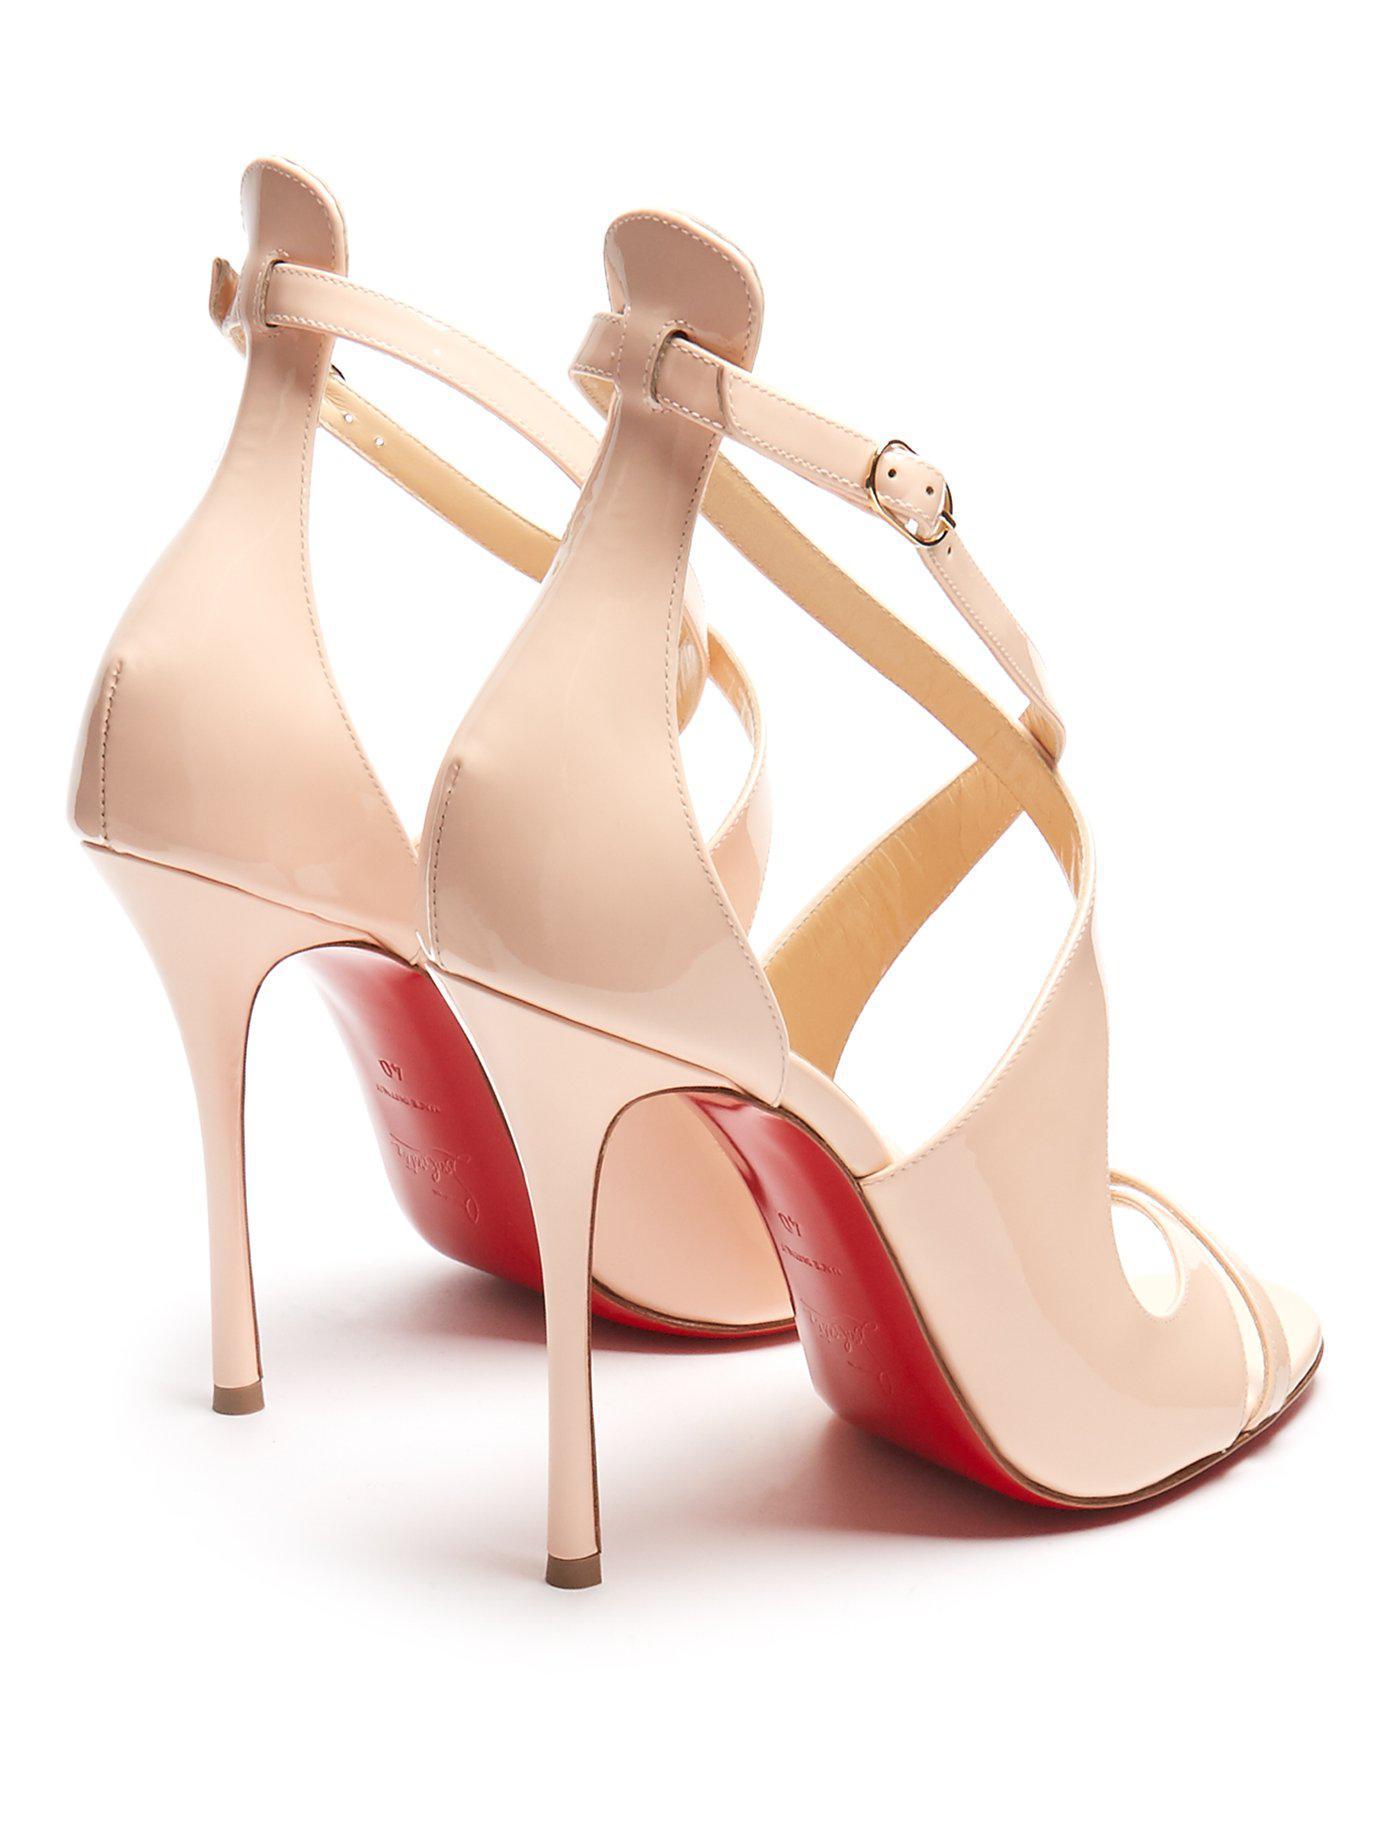 buy popular 899f8 3f5f4 Women's Pink Malefissima Patent Leather Pumps